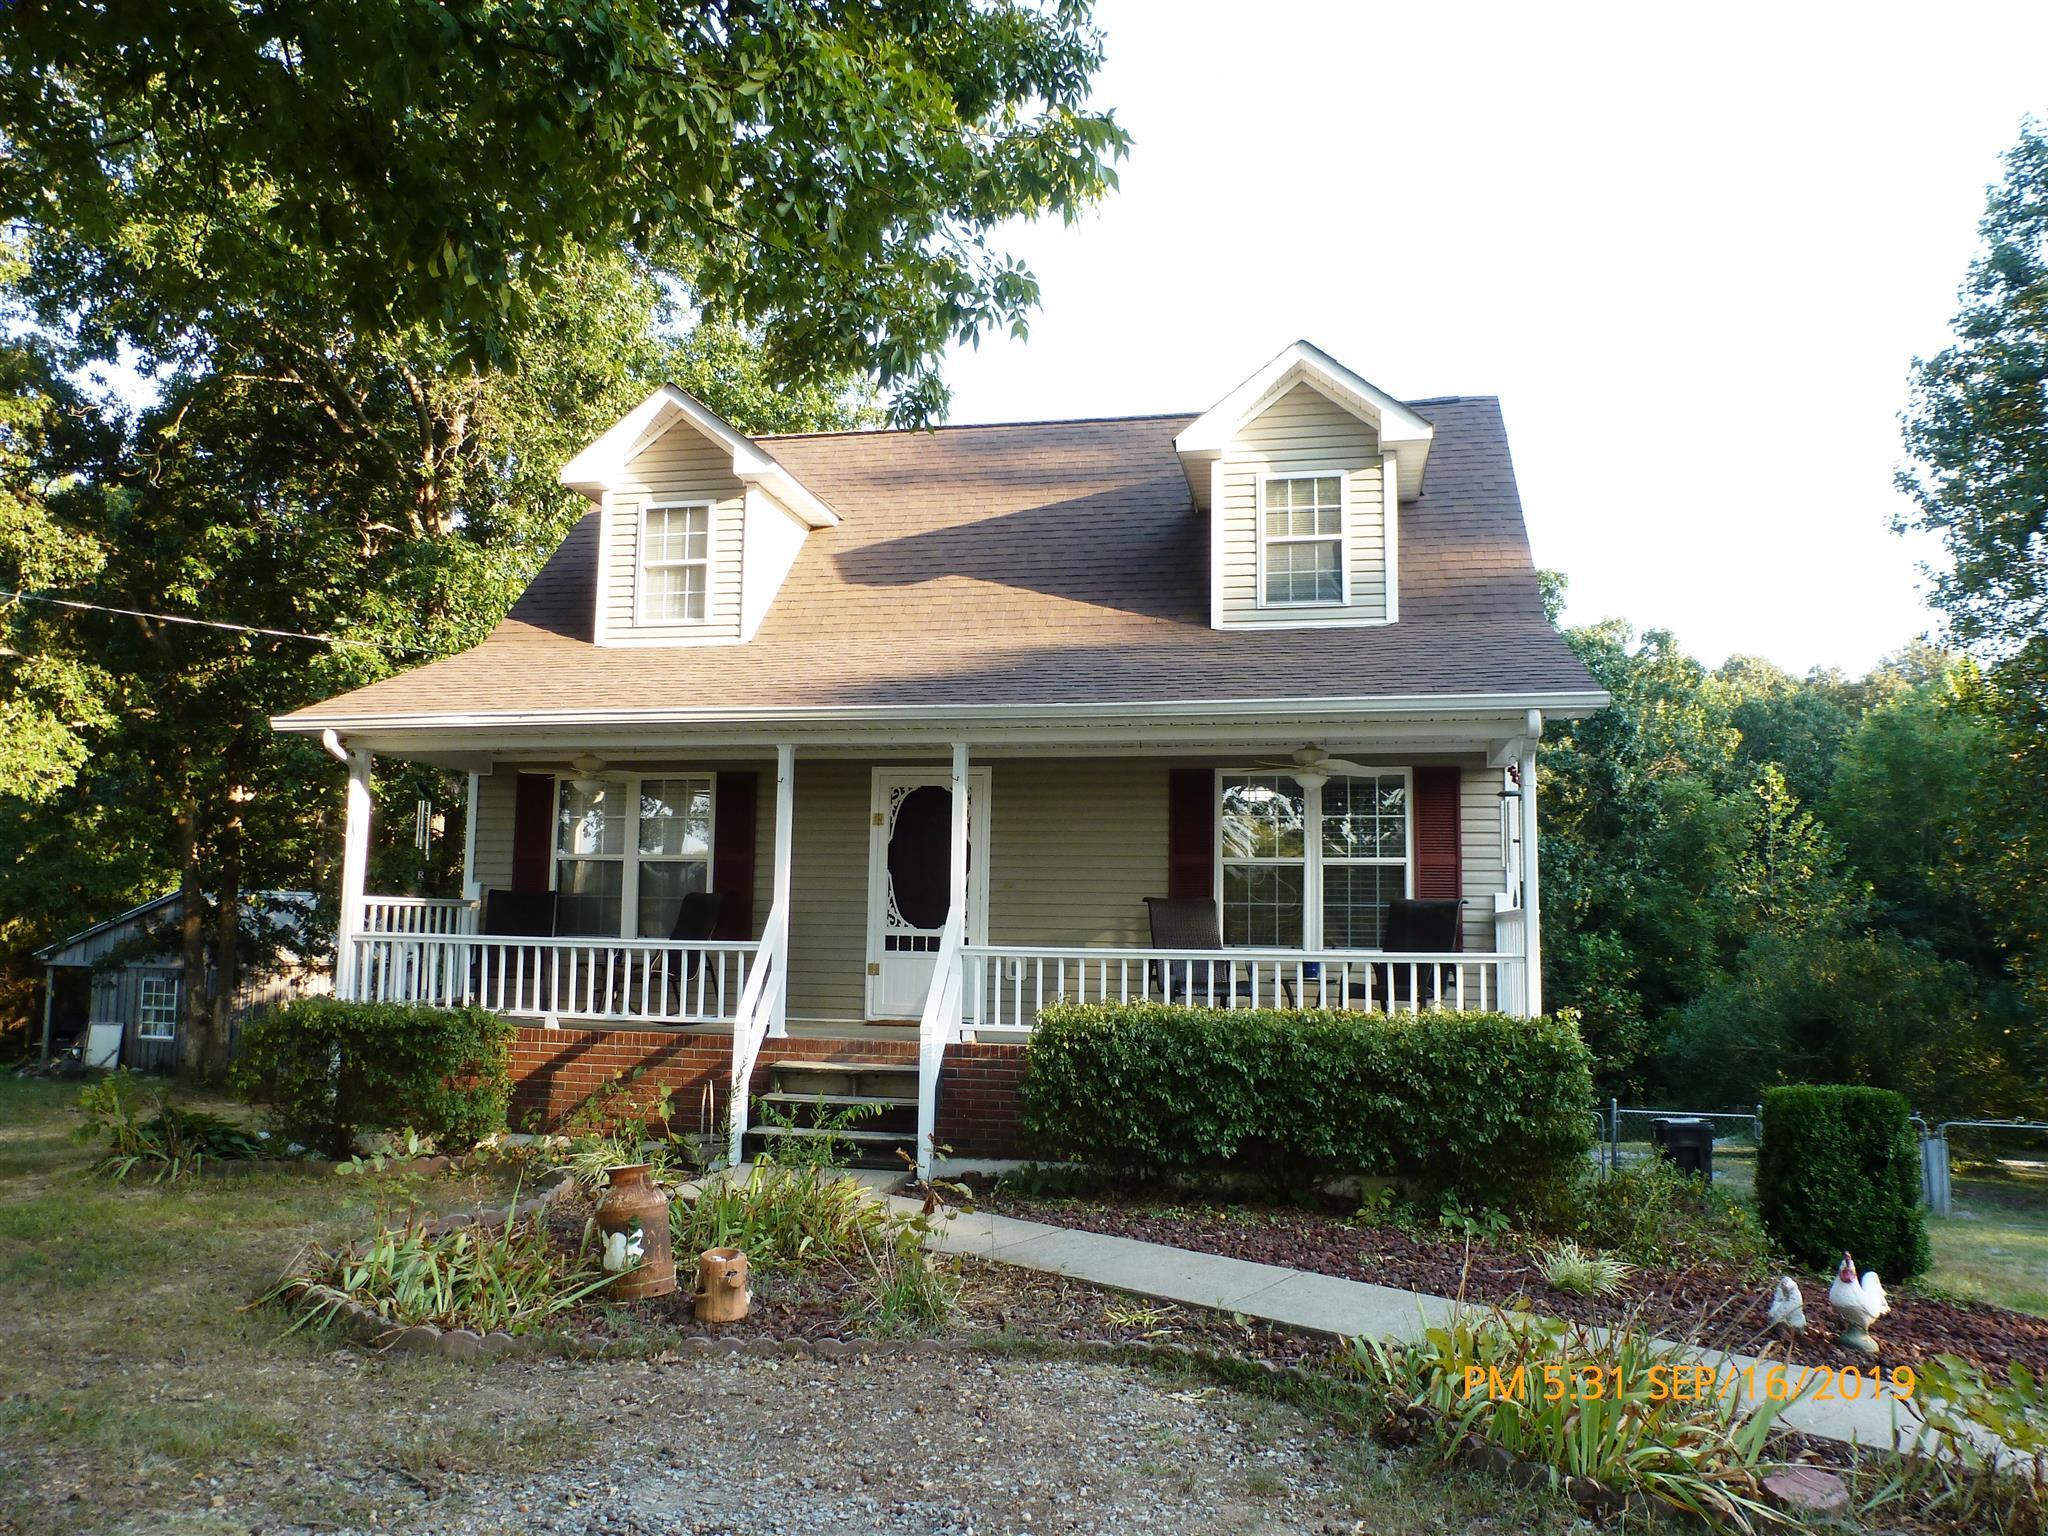 1207 Delmont Church Rd, Cadiz, KY 42211 - Cadiz, KY real estate listing